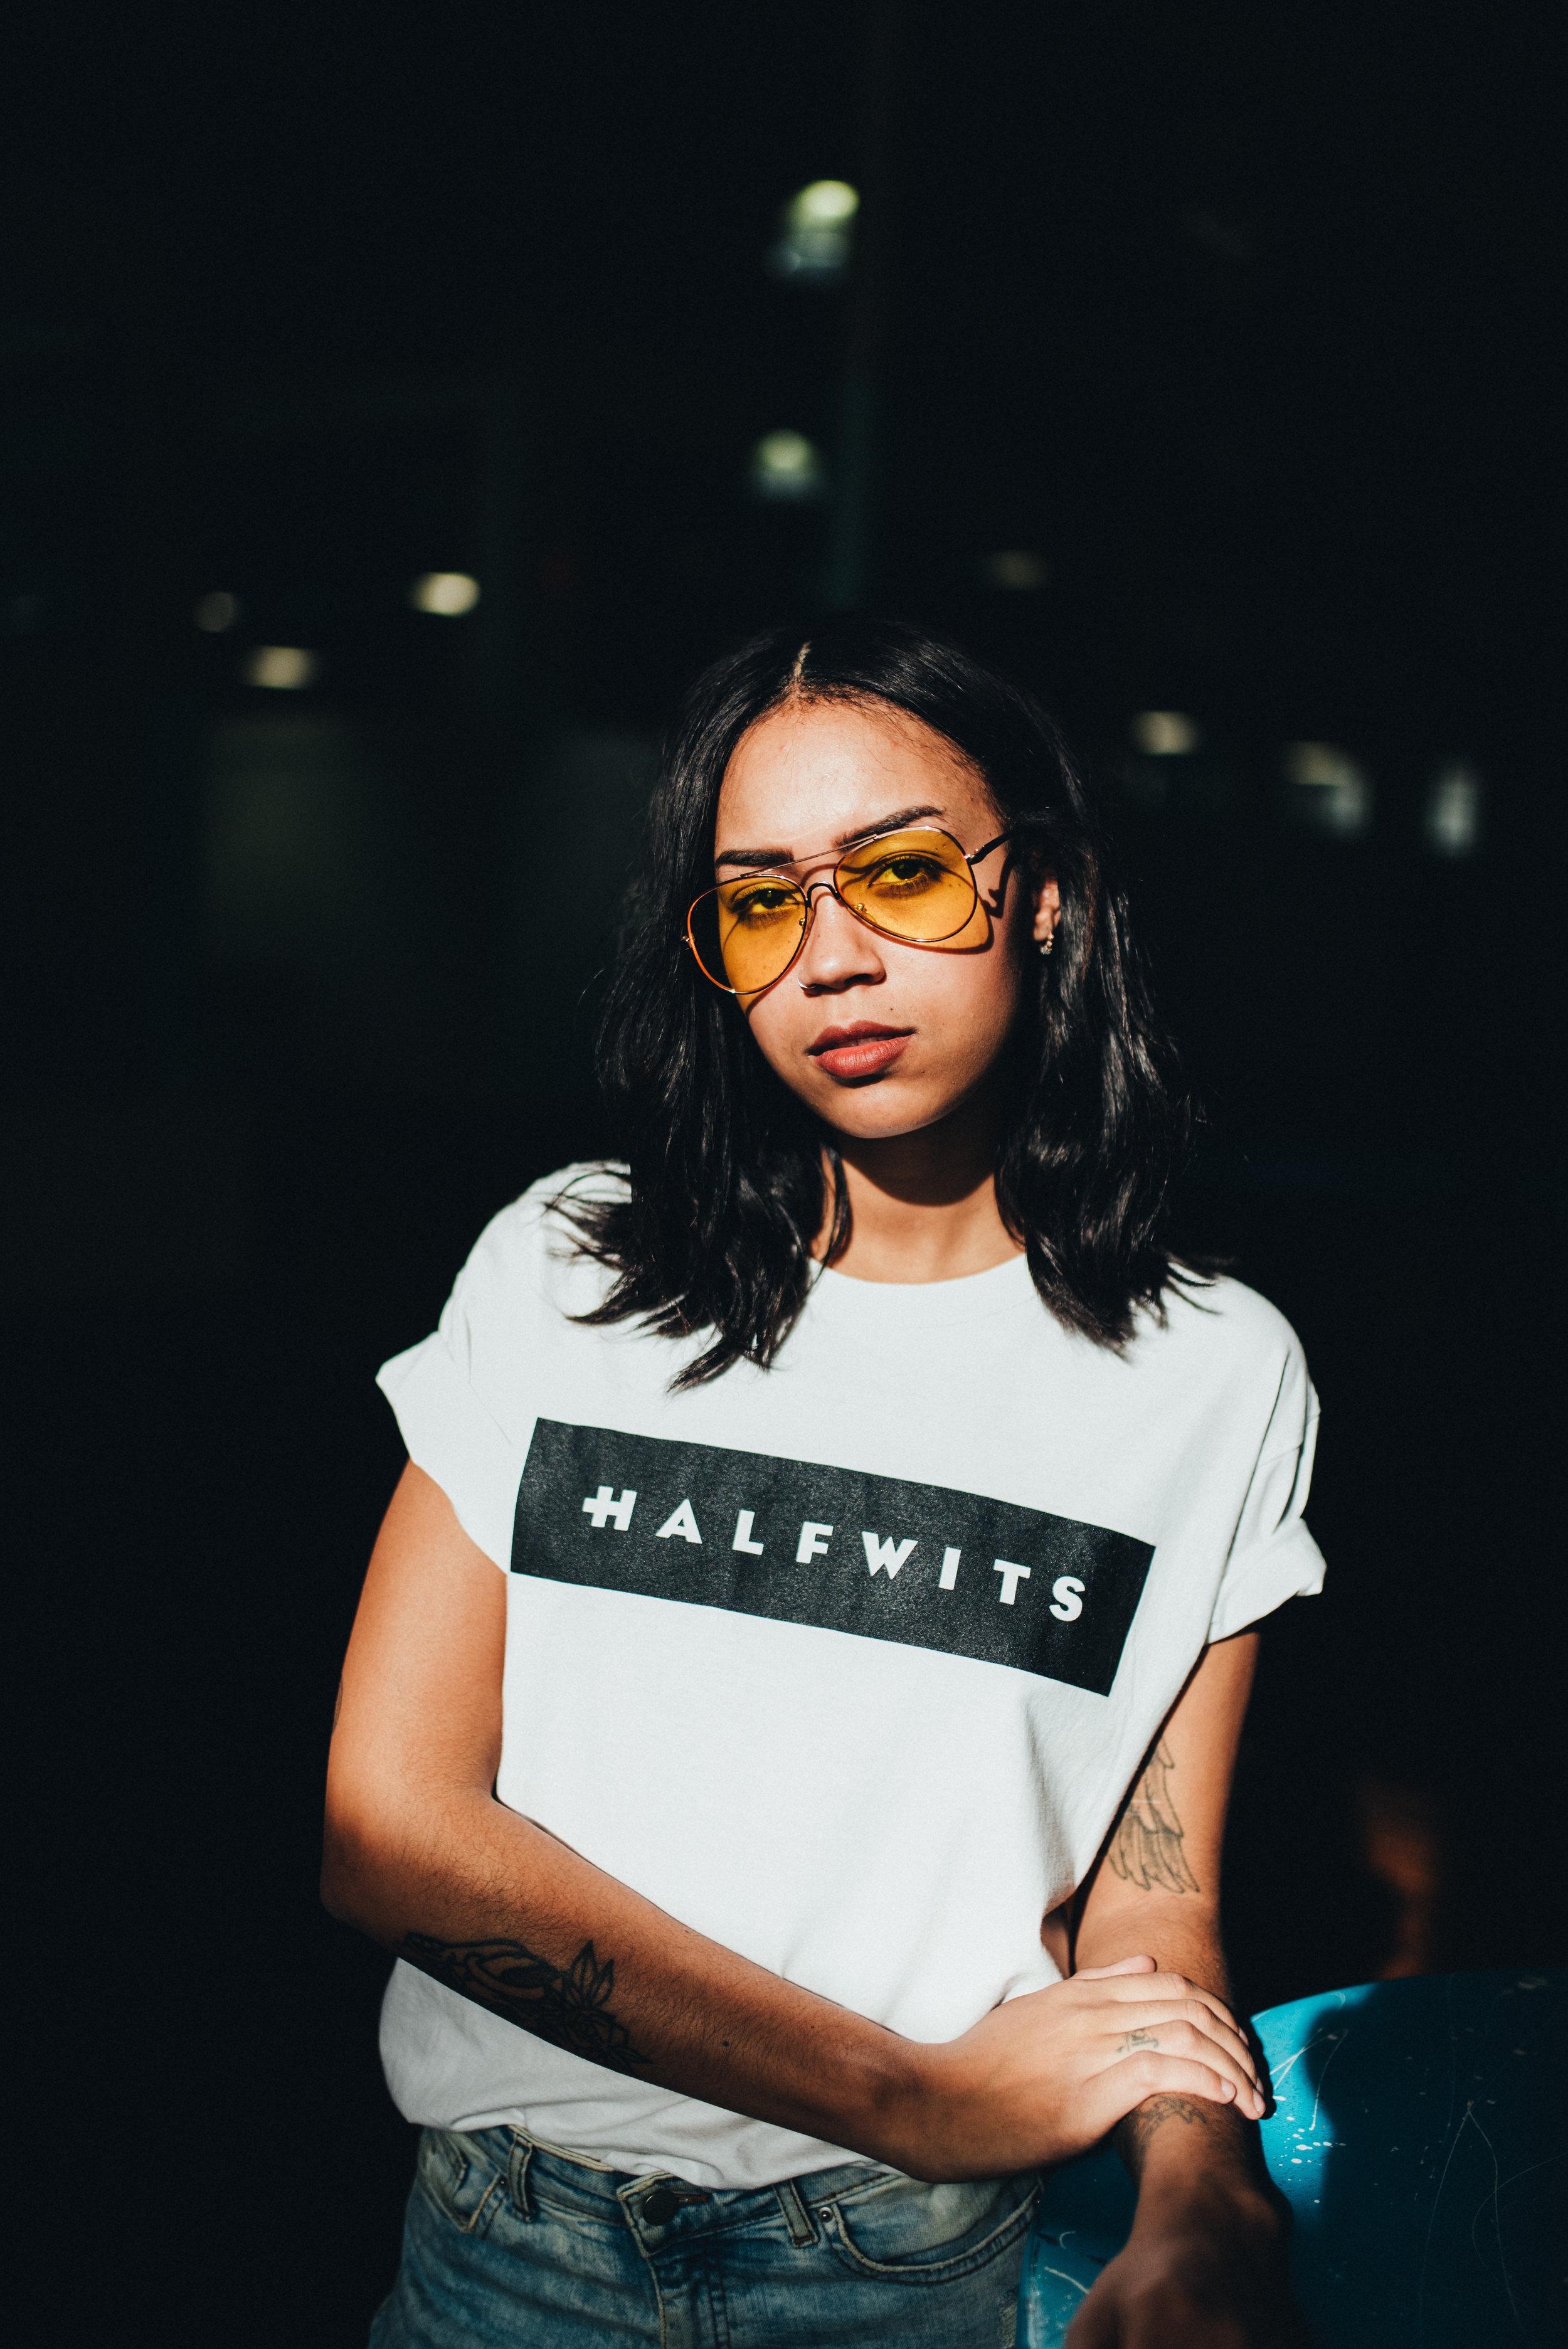 HALFWITS -